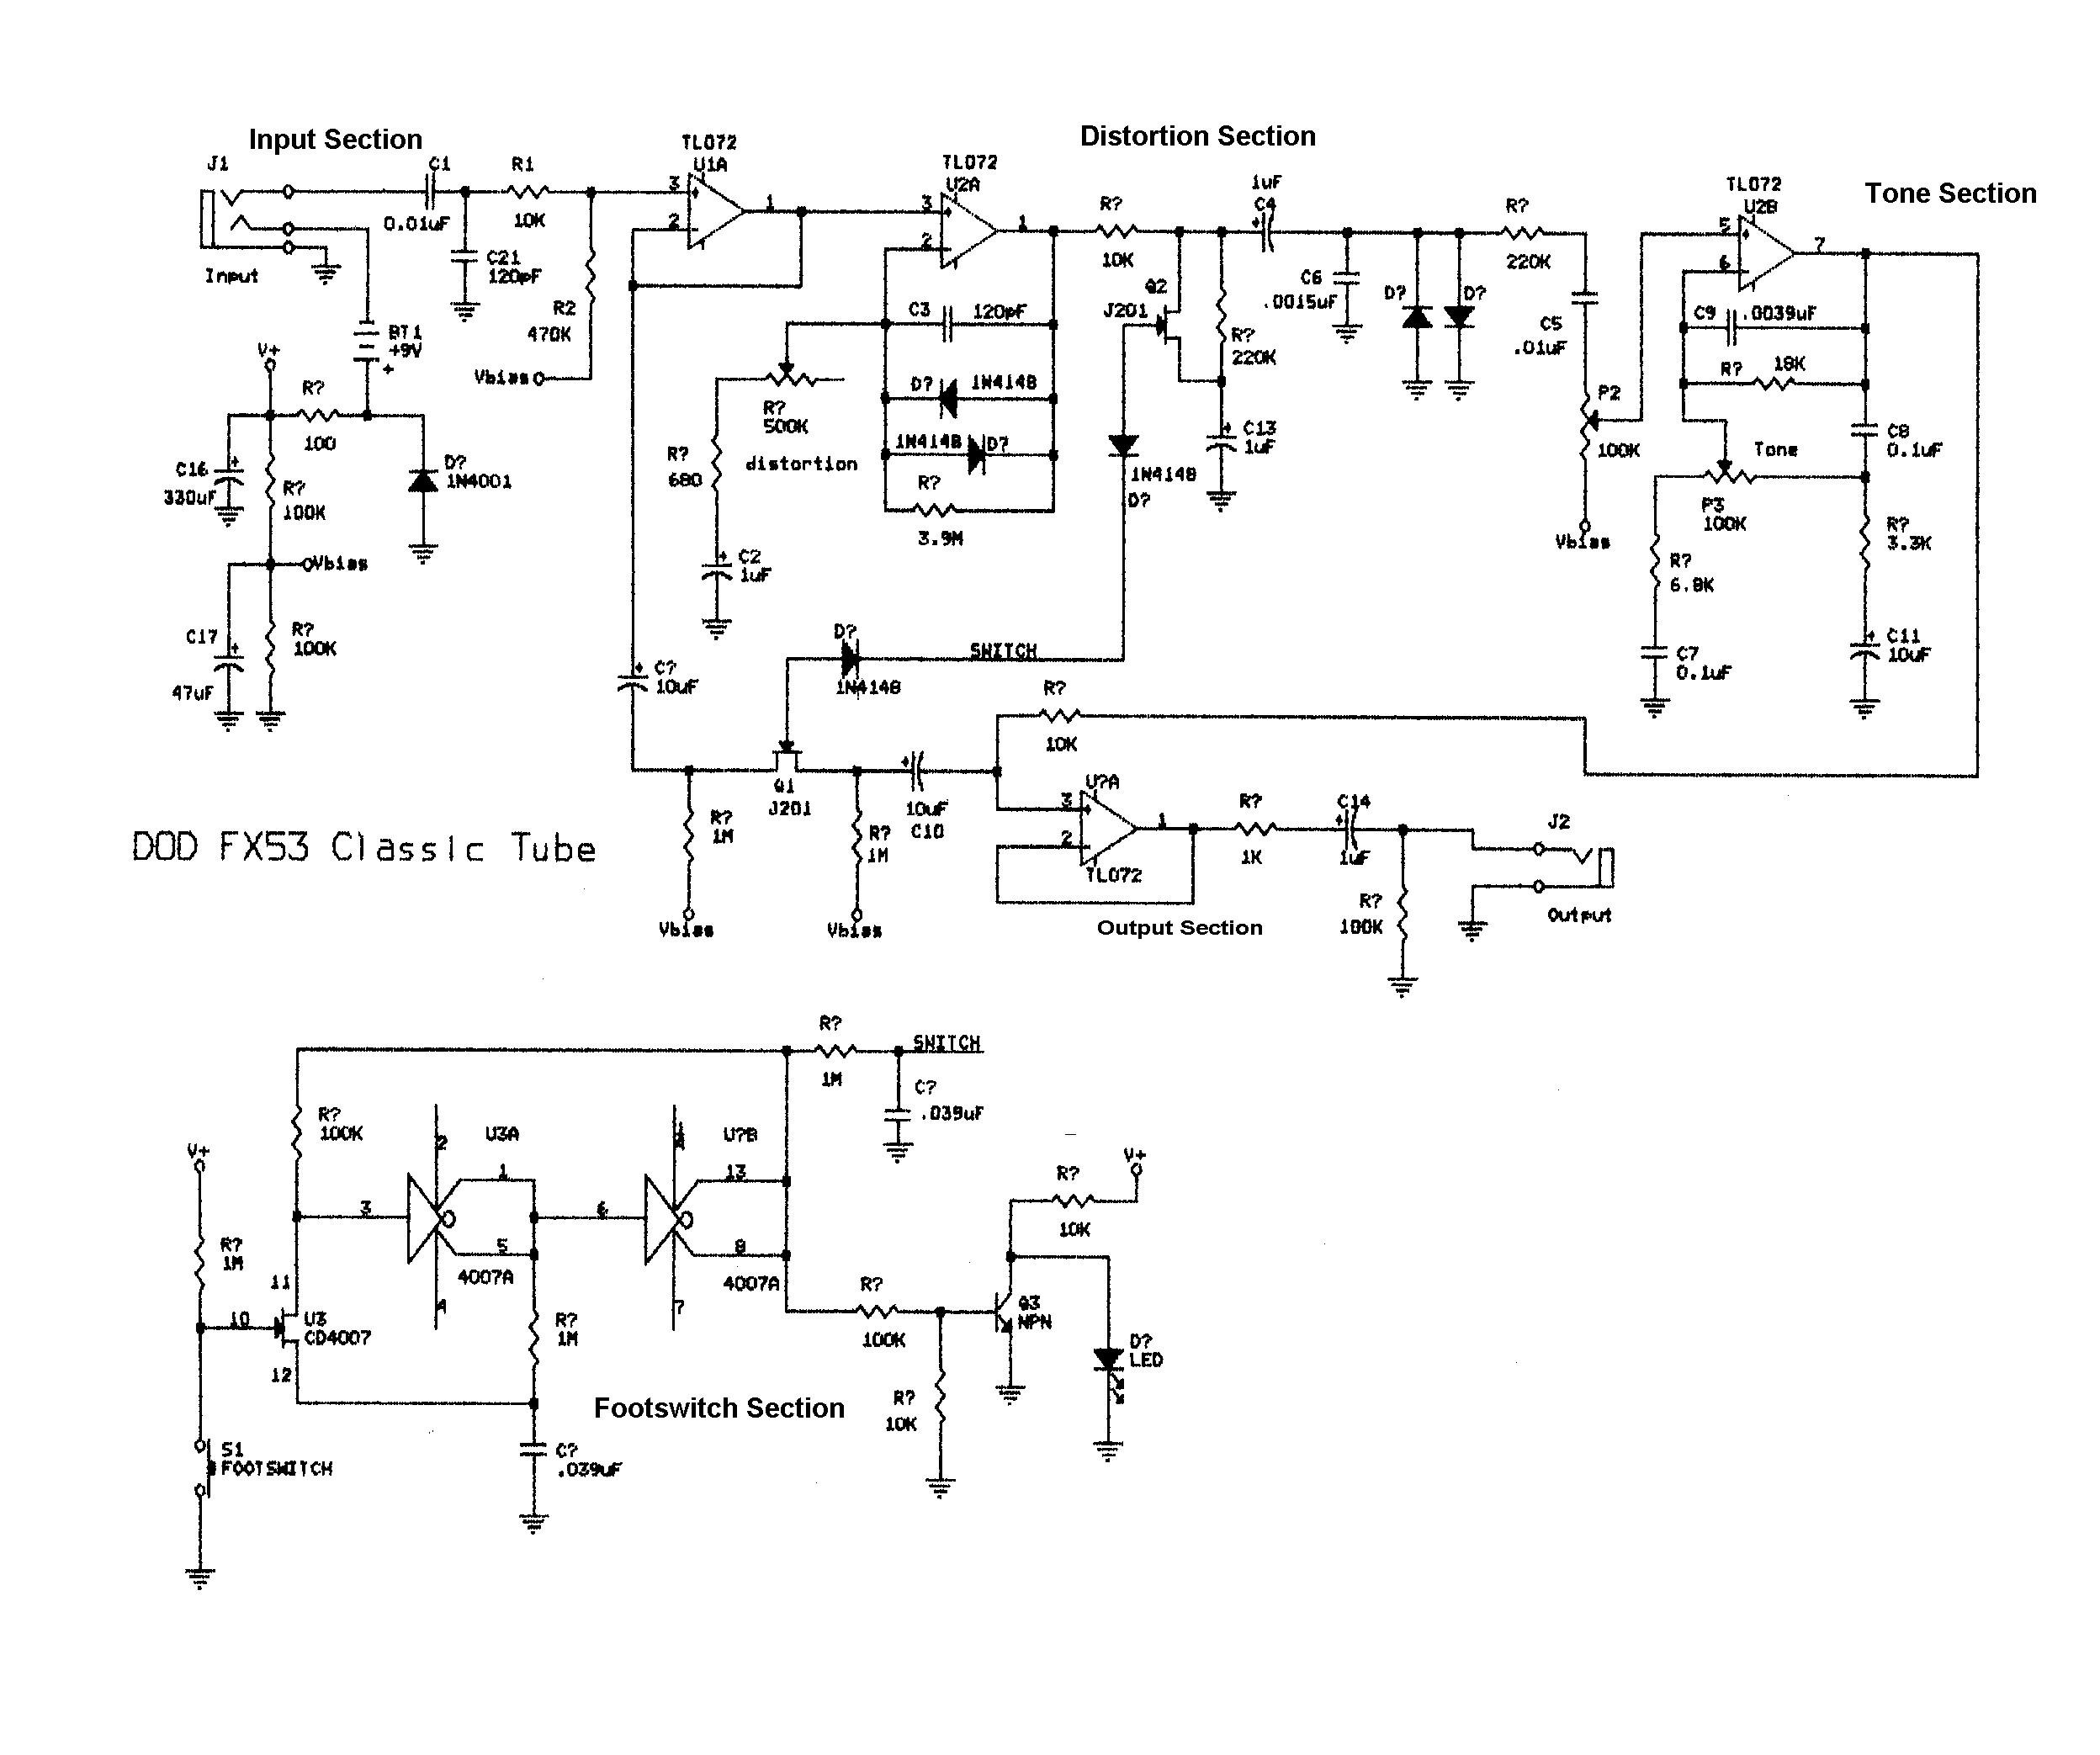 Bass Guitar Wiring Diagram Schematics Fender Jaguar Diy Diagrams Fresh Experimentalists Anonymous Archives